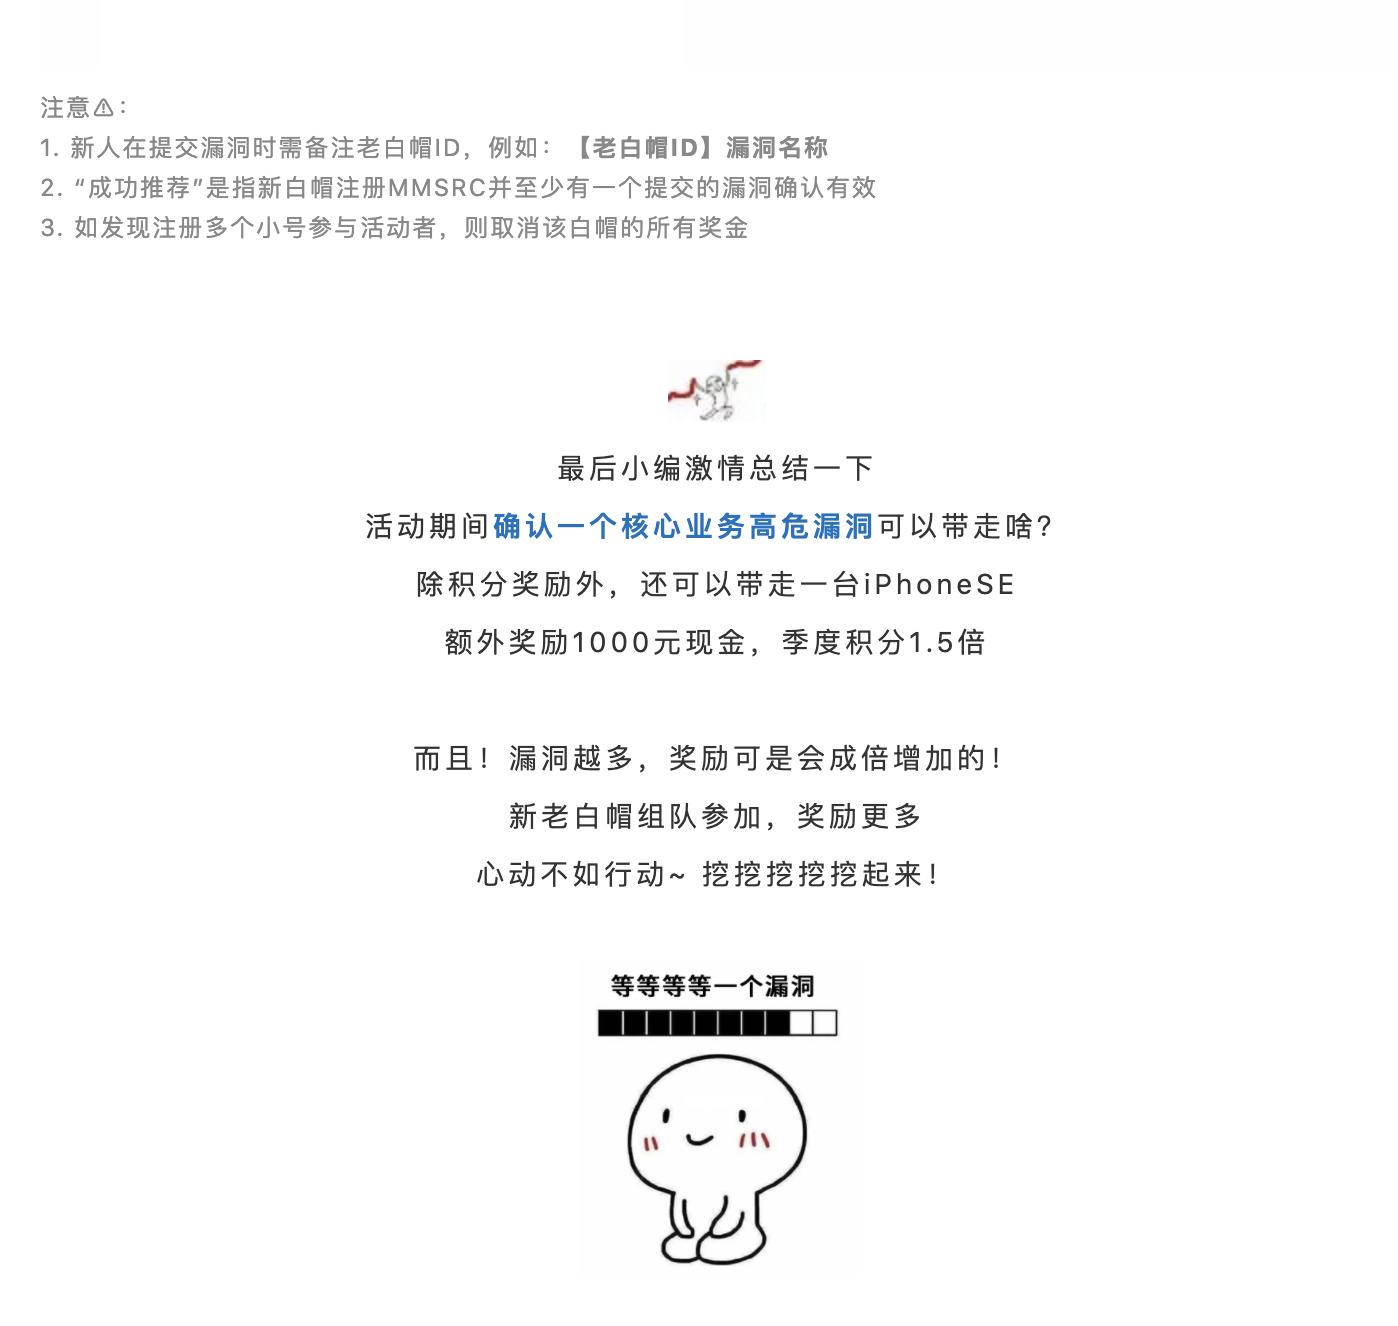 https://momo-mmsrc.oss-cn-hangzhou.aliyuncs.com/img-66bd38bb-ef1a-34d8-acac-e49060b9ac51.png